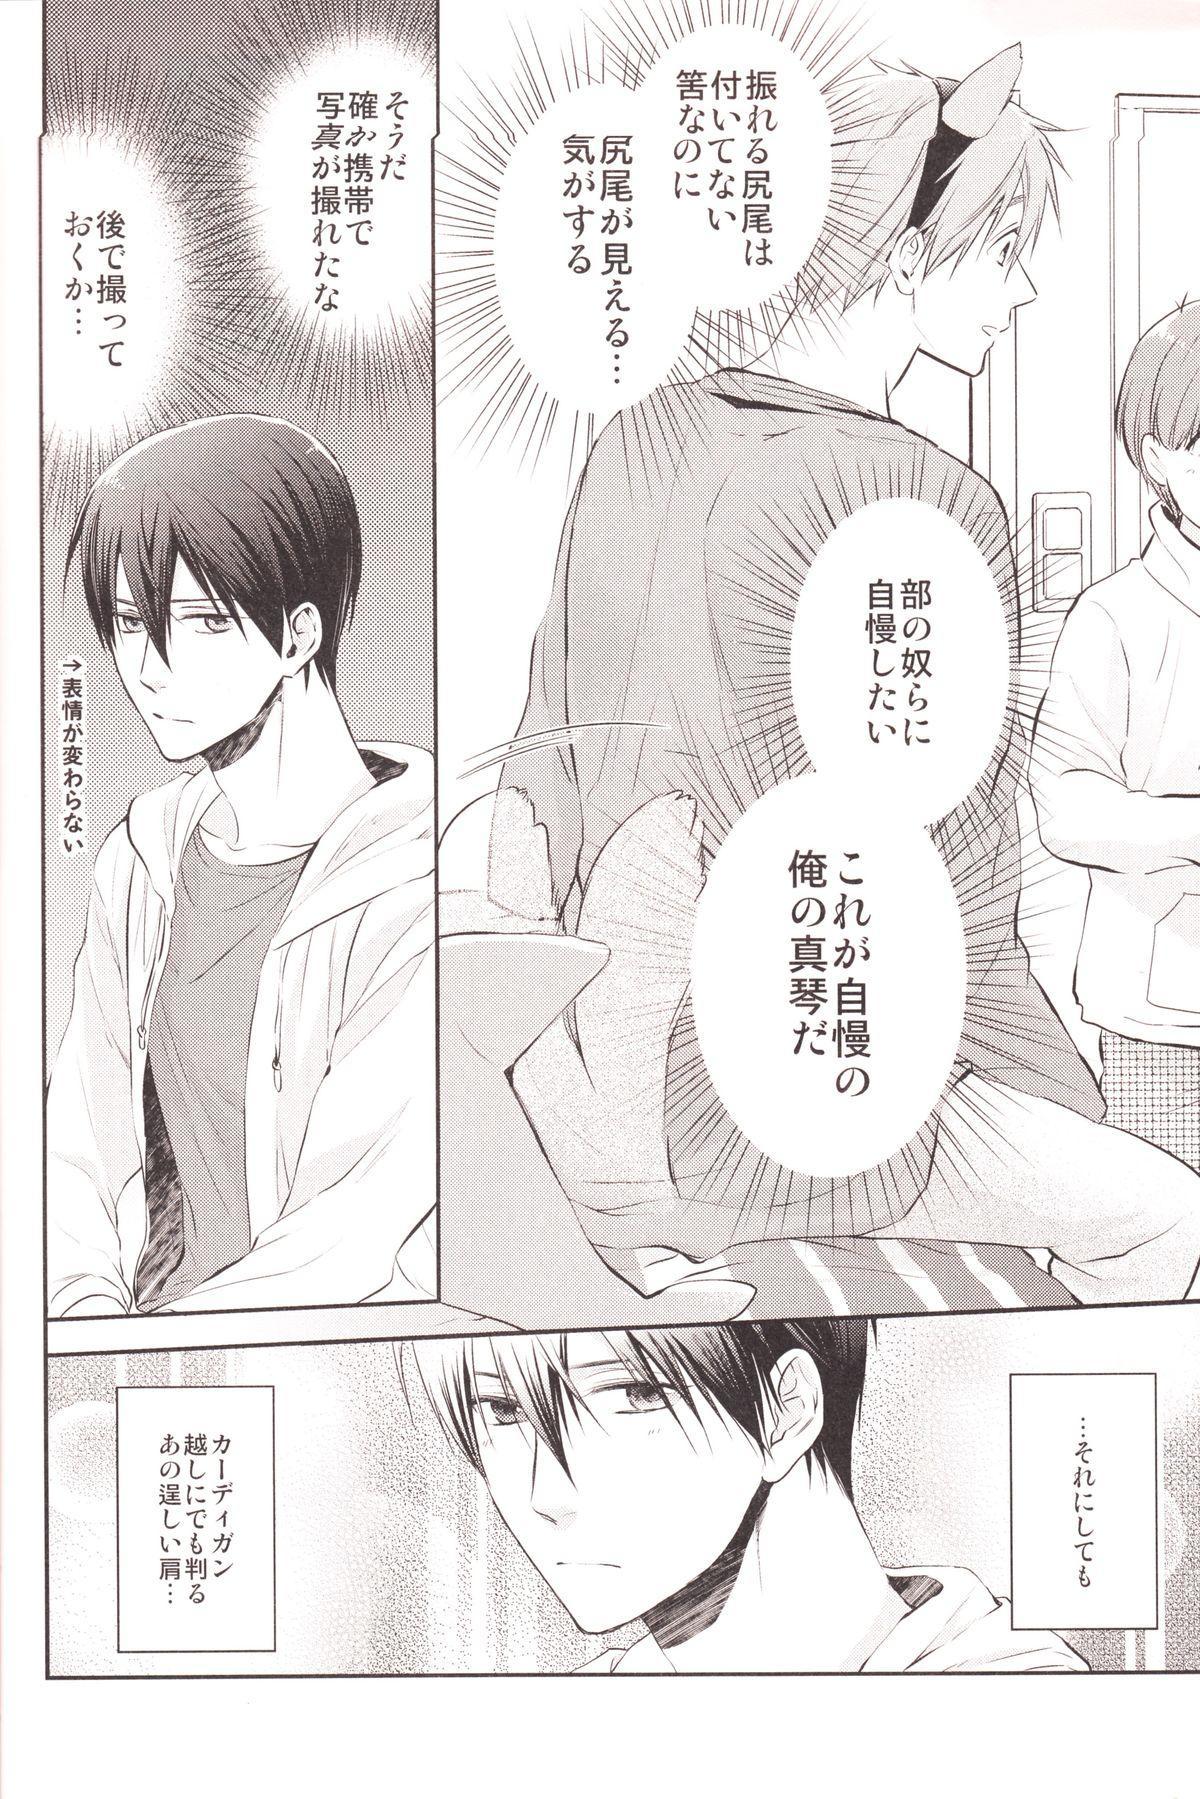 Haru-chan no Wanko 10